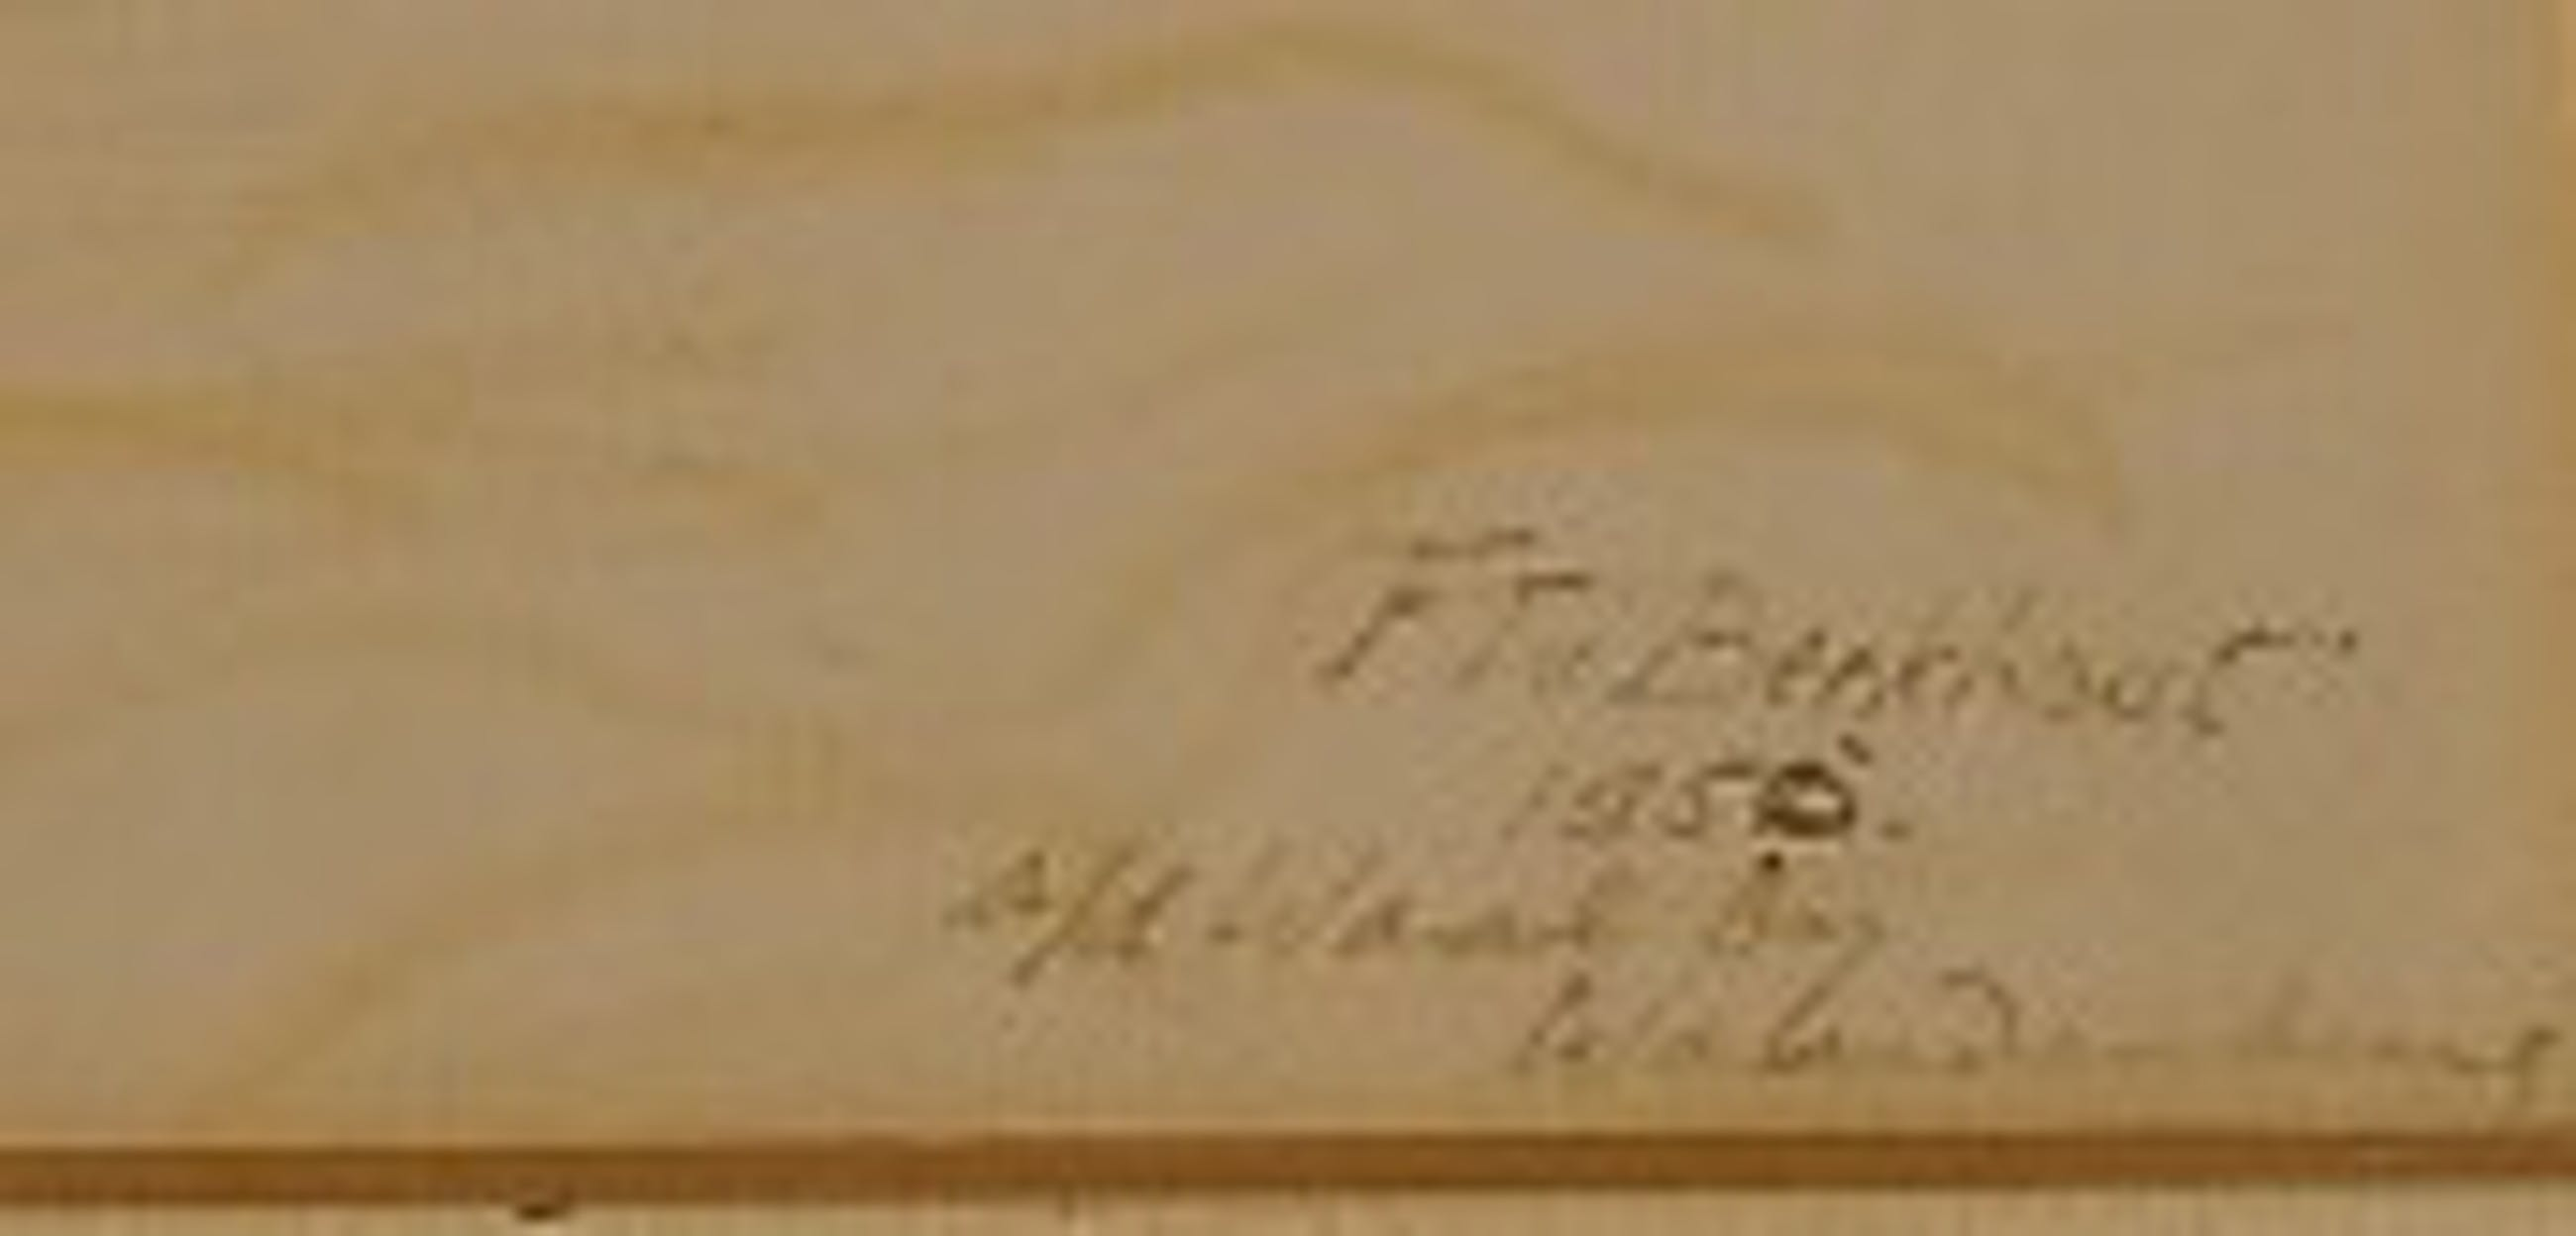 Frederik Teding van Berkhout - Jhr. (1883-1965) kopen? Bied vanaf 25!